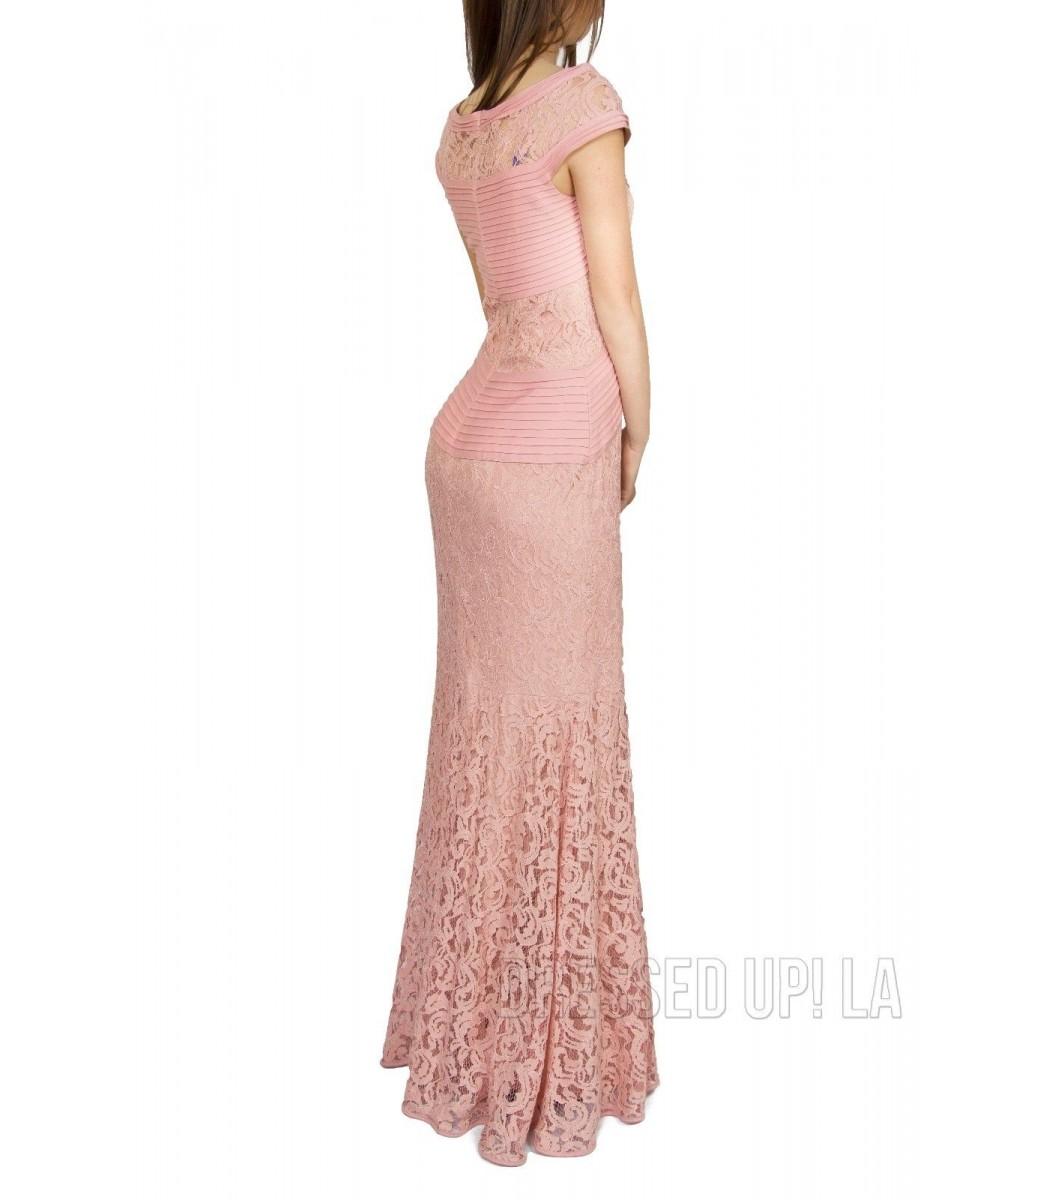 Tadashi Shoji ACZ1520L Pink Opal Lace Evening Gown Dress Size 12 NWT ...